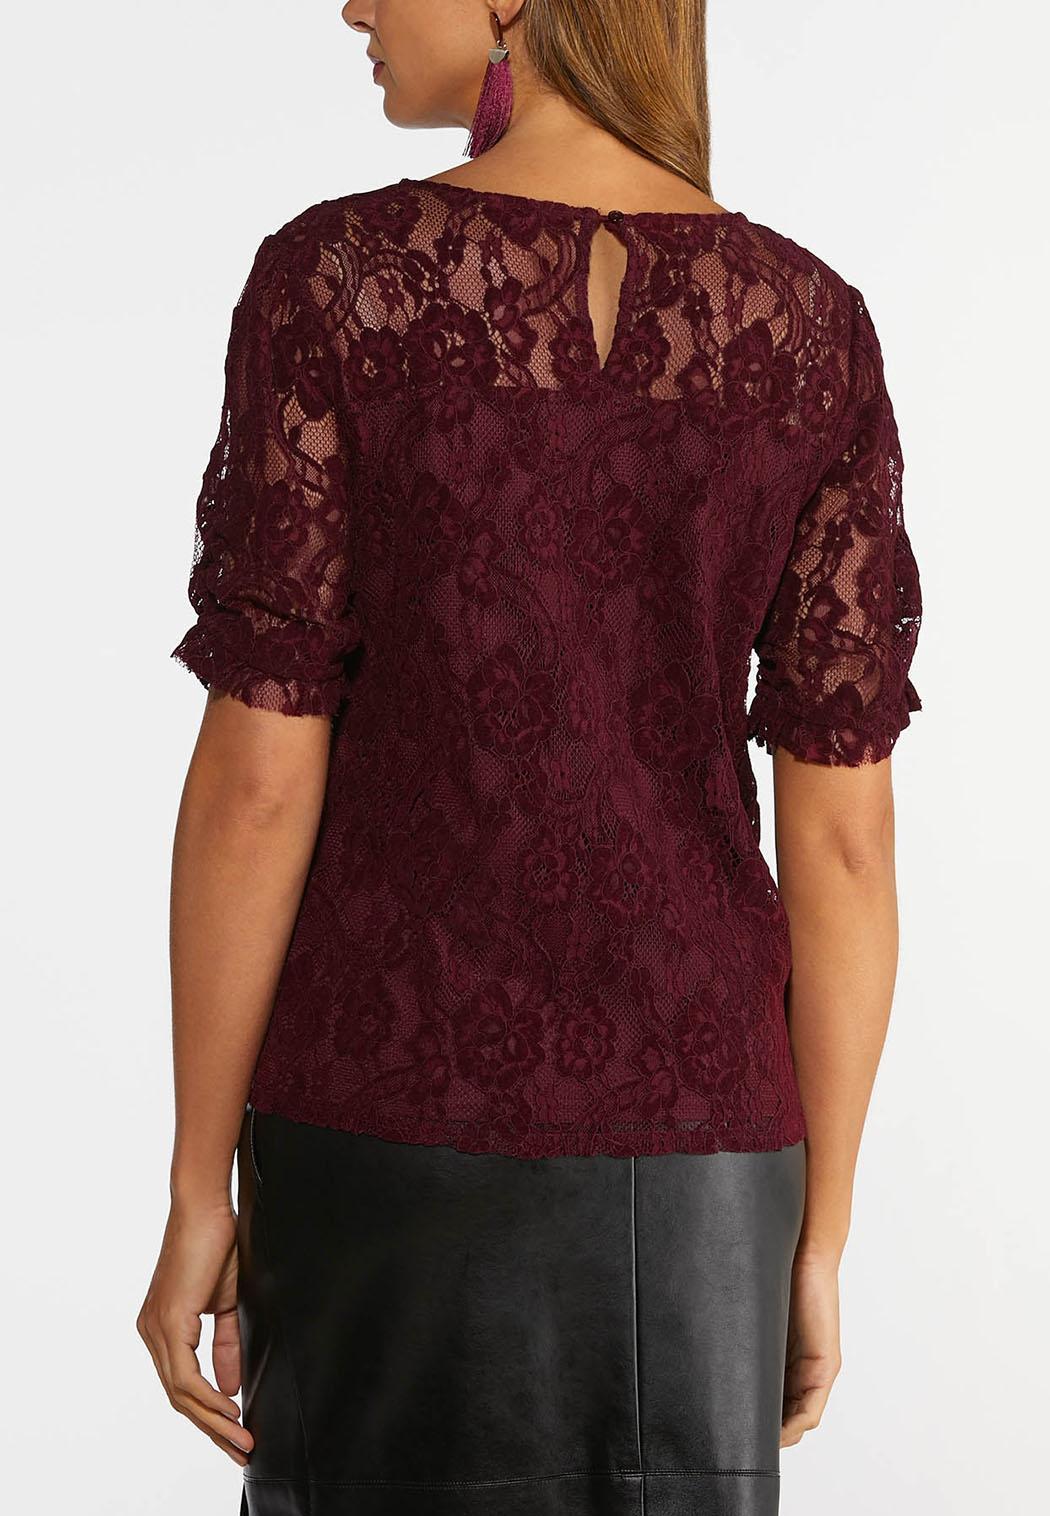 Plus Size Wine Lace Top (Item #44376248)